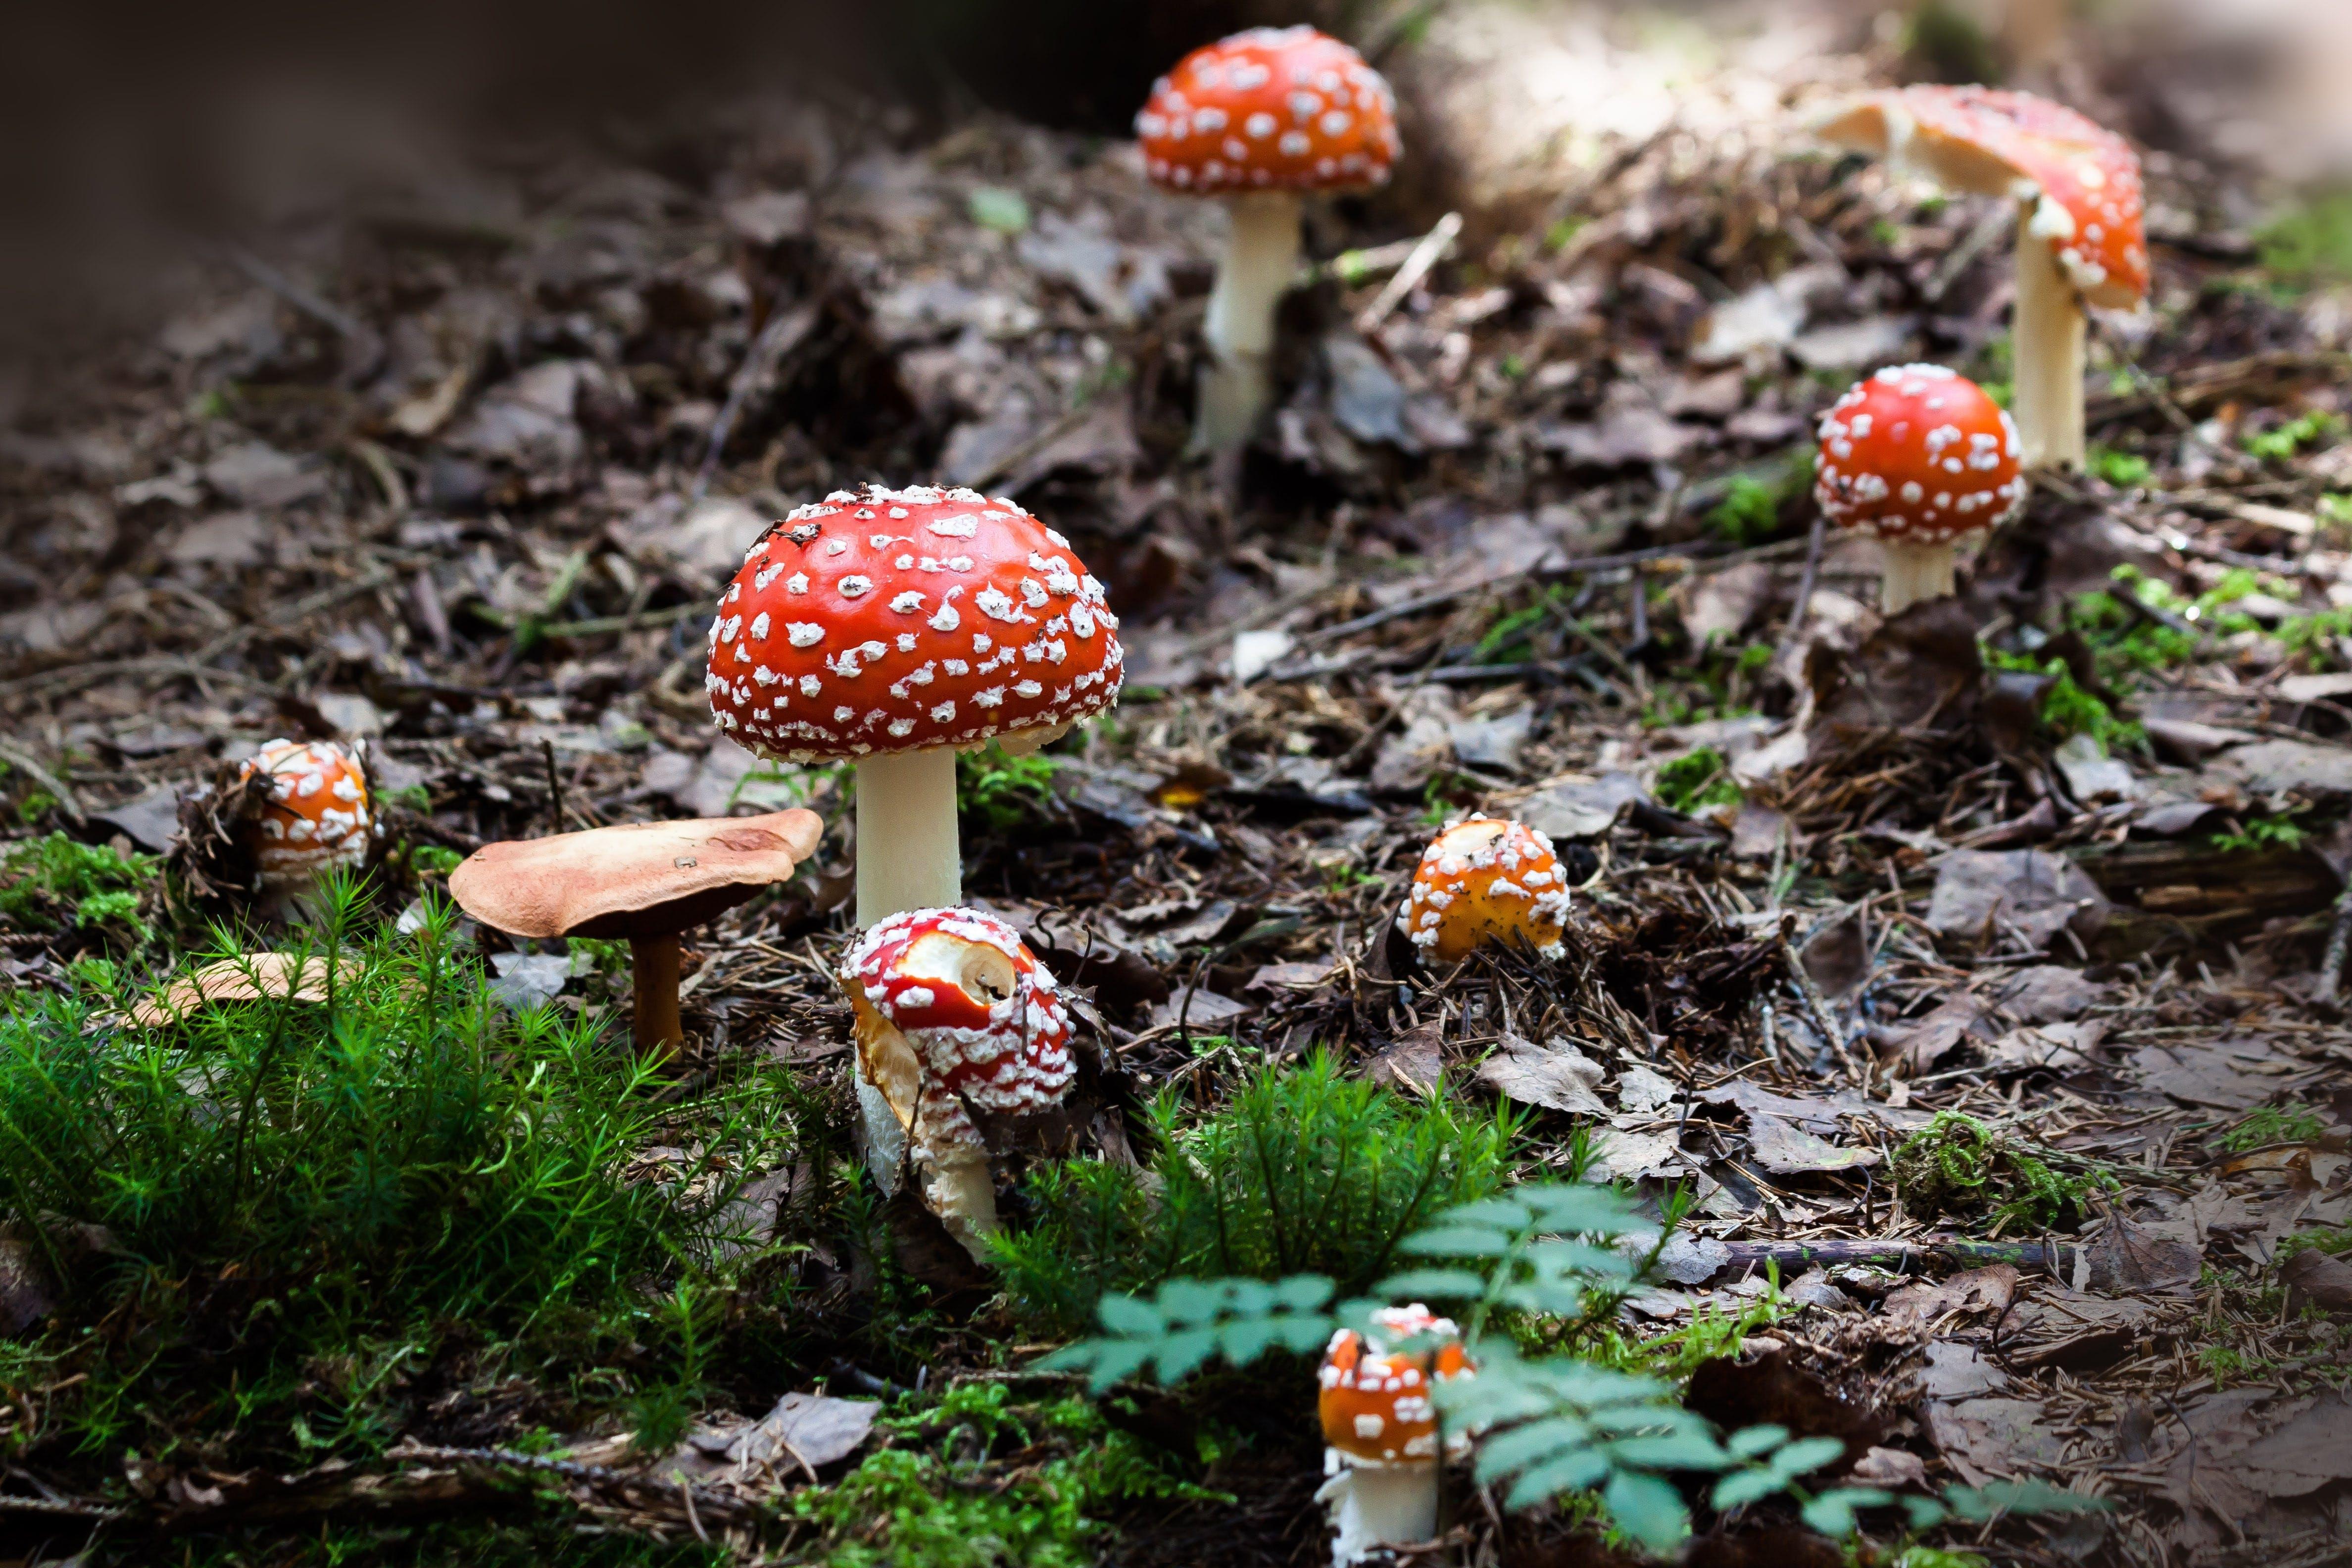 Red Mushroom Near Green Grass